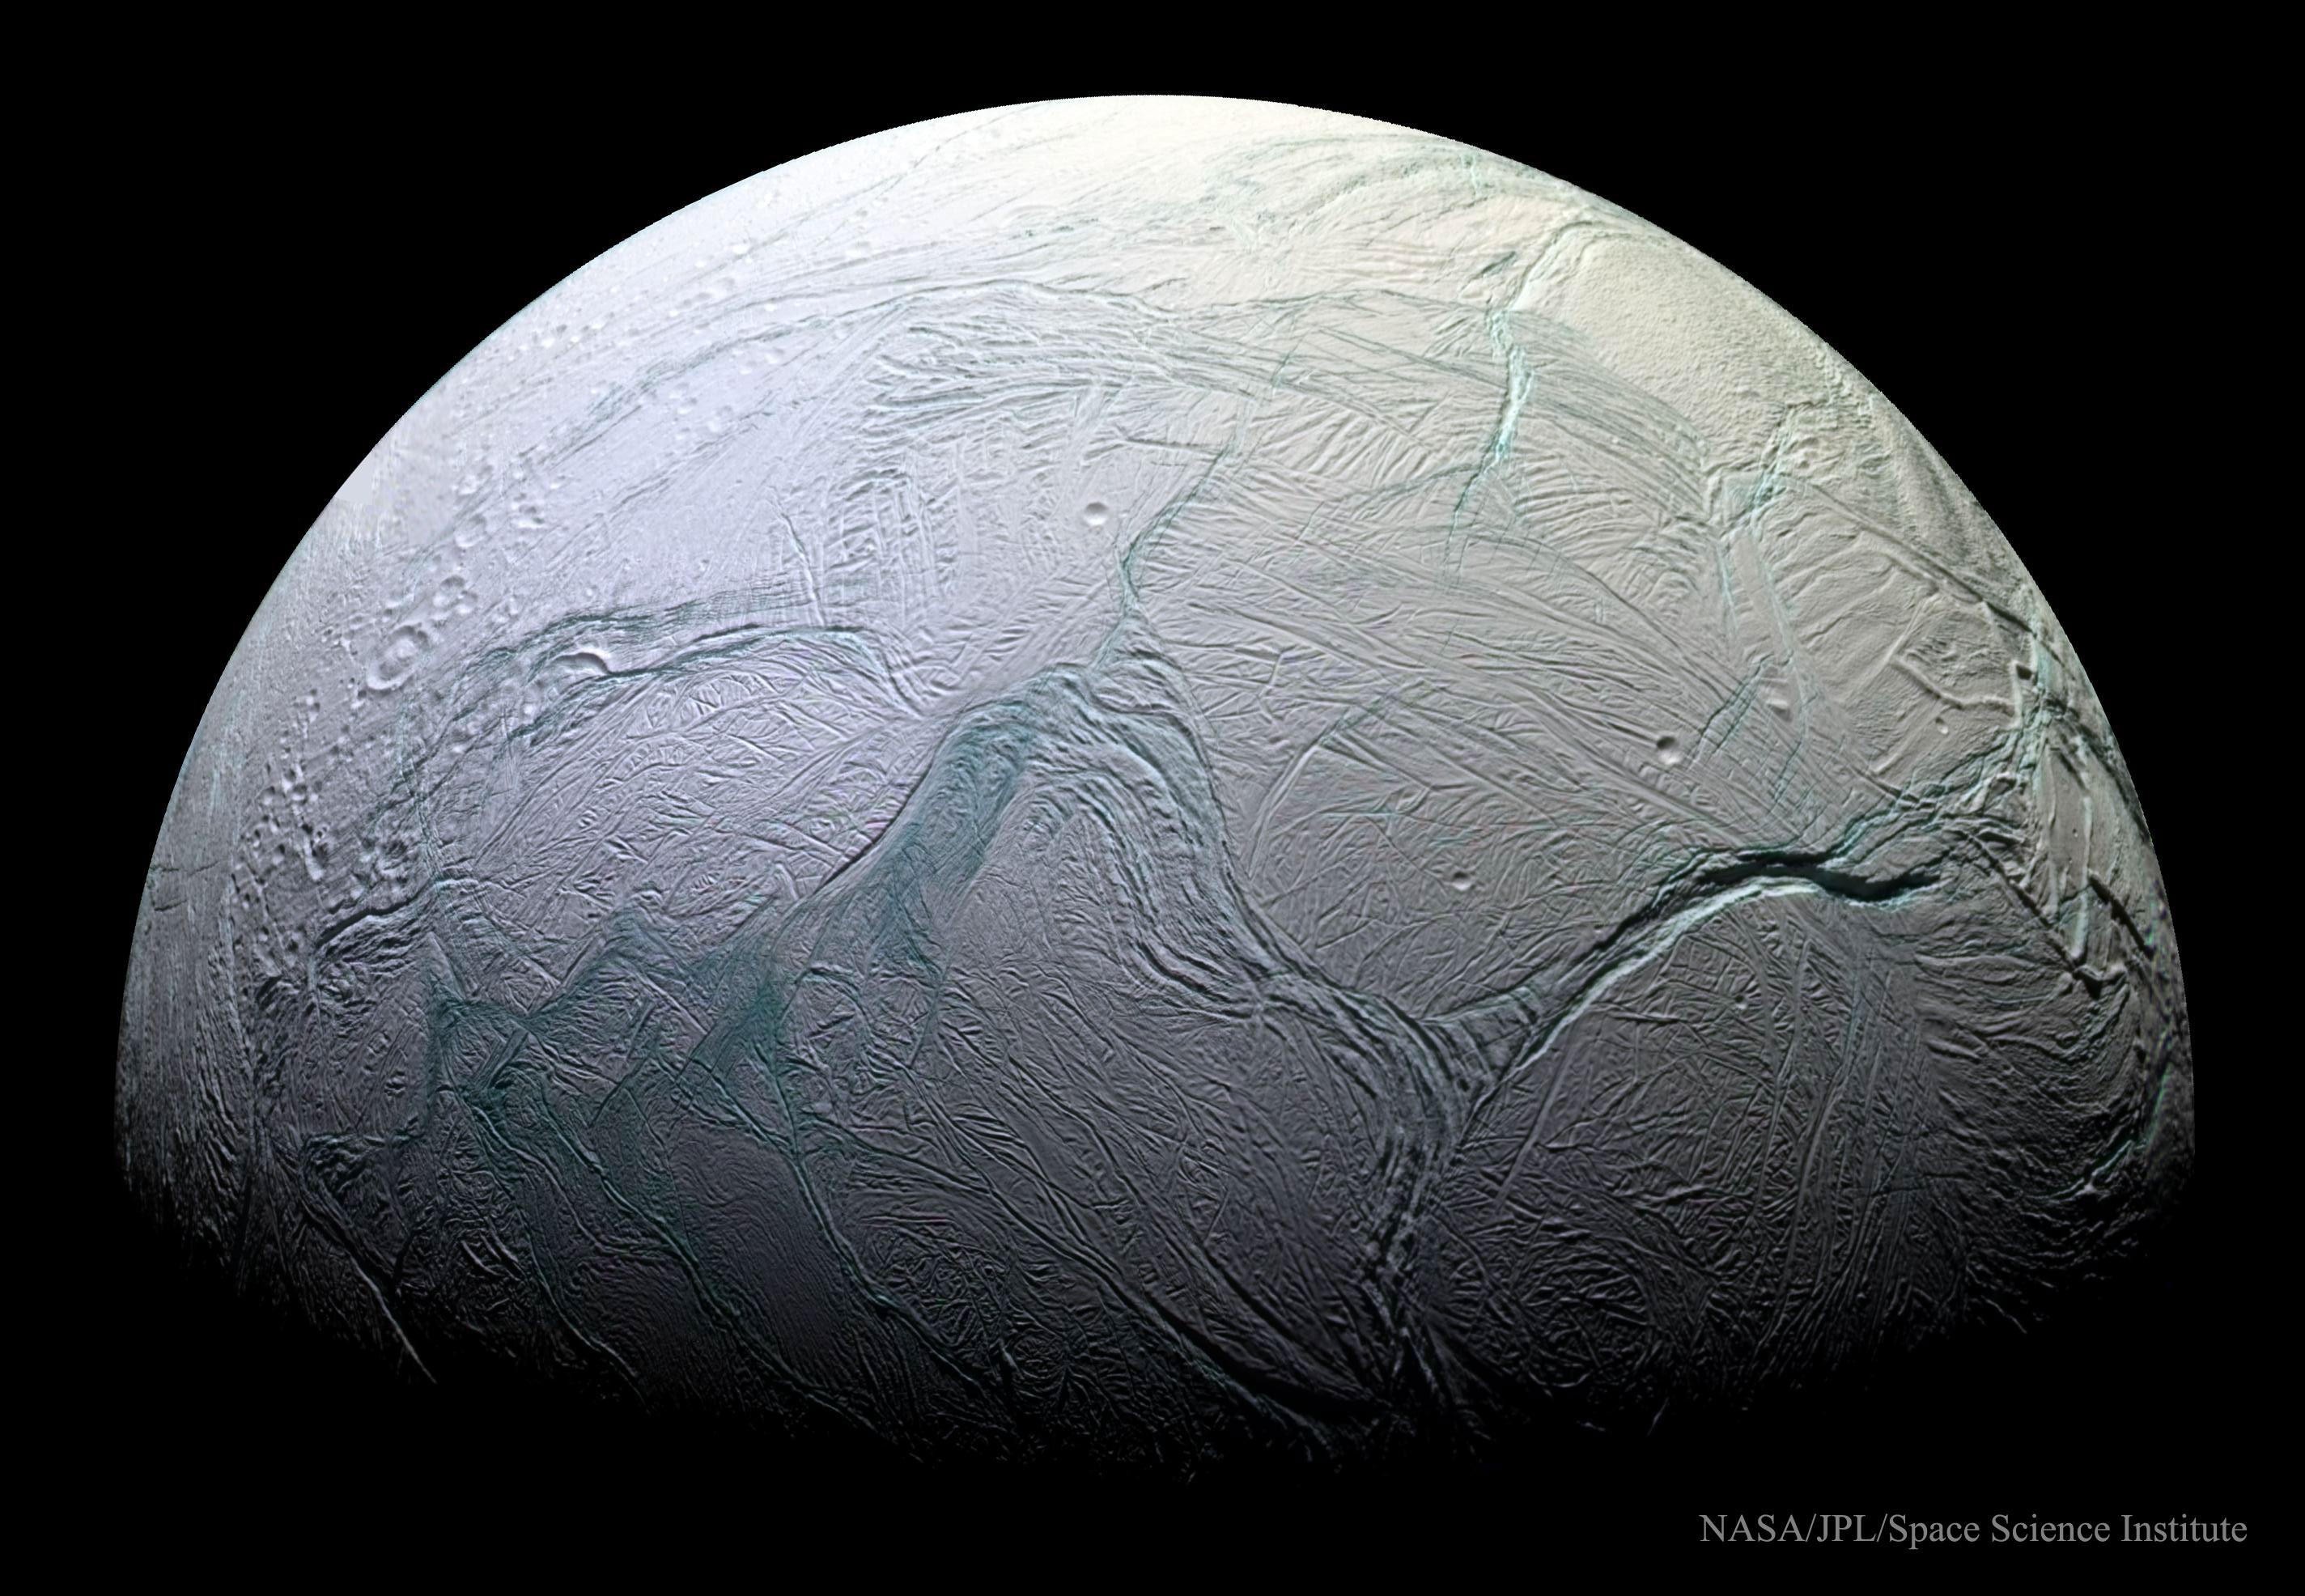 http://scienceandentertainmentexchange.org/wp-content/uploads/2020/05/Enceladus05_Cassini_2848.jpg